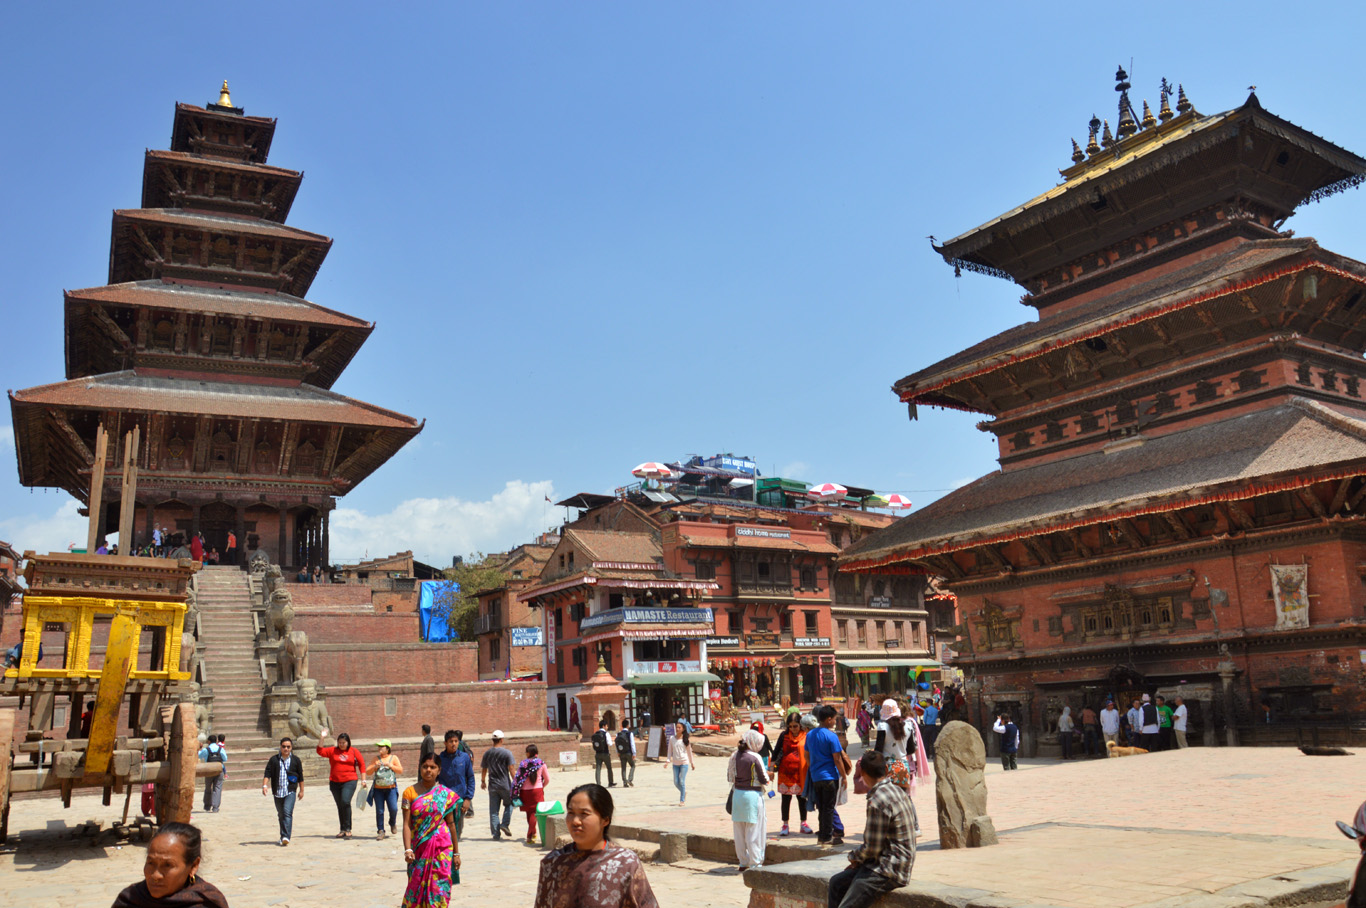 5-level Nyatapola temple on the left